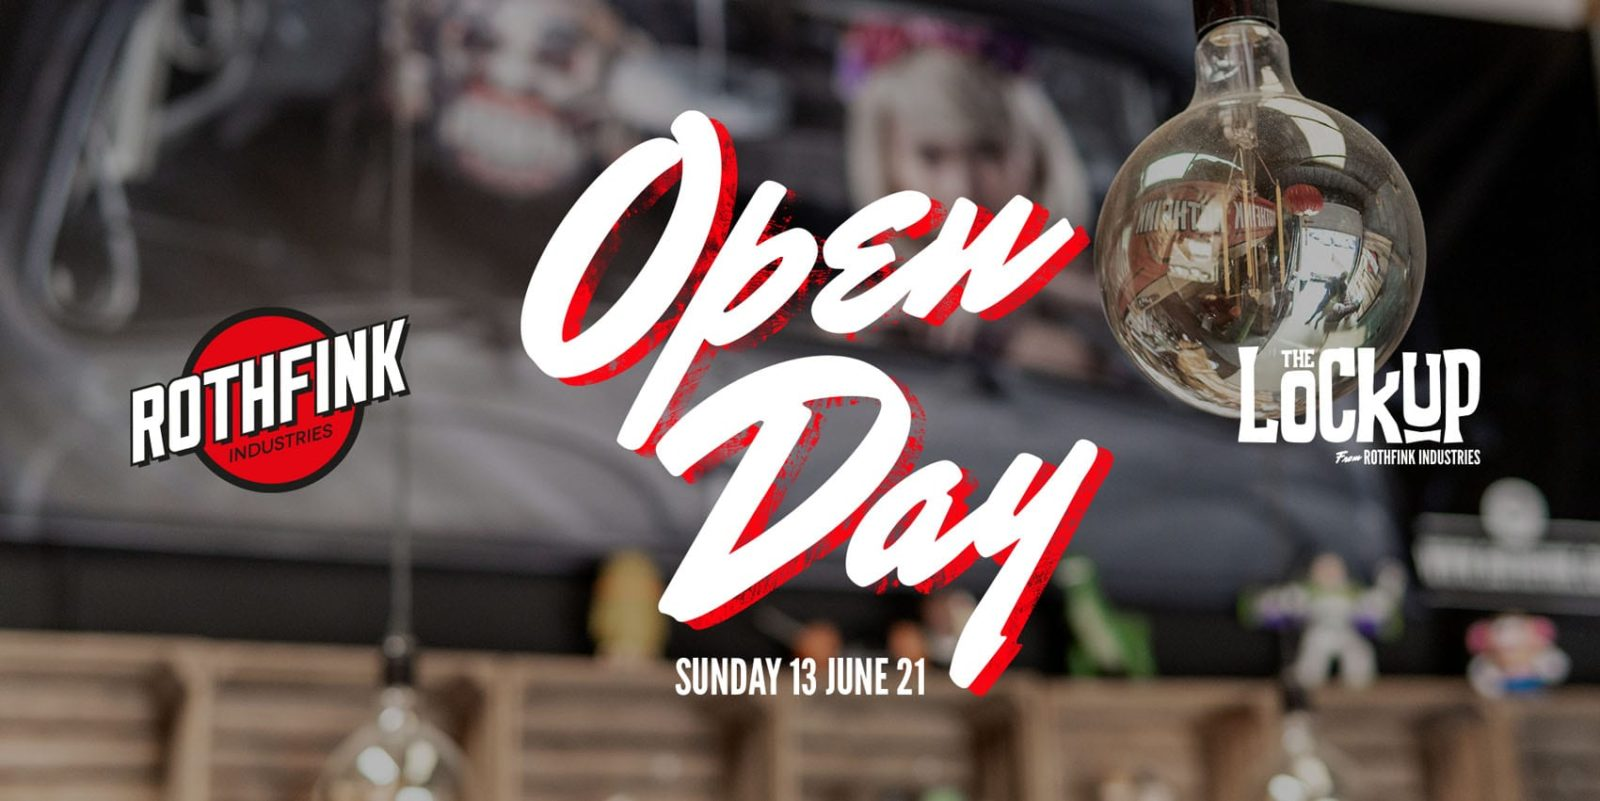 rothfink Open Day 2021